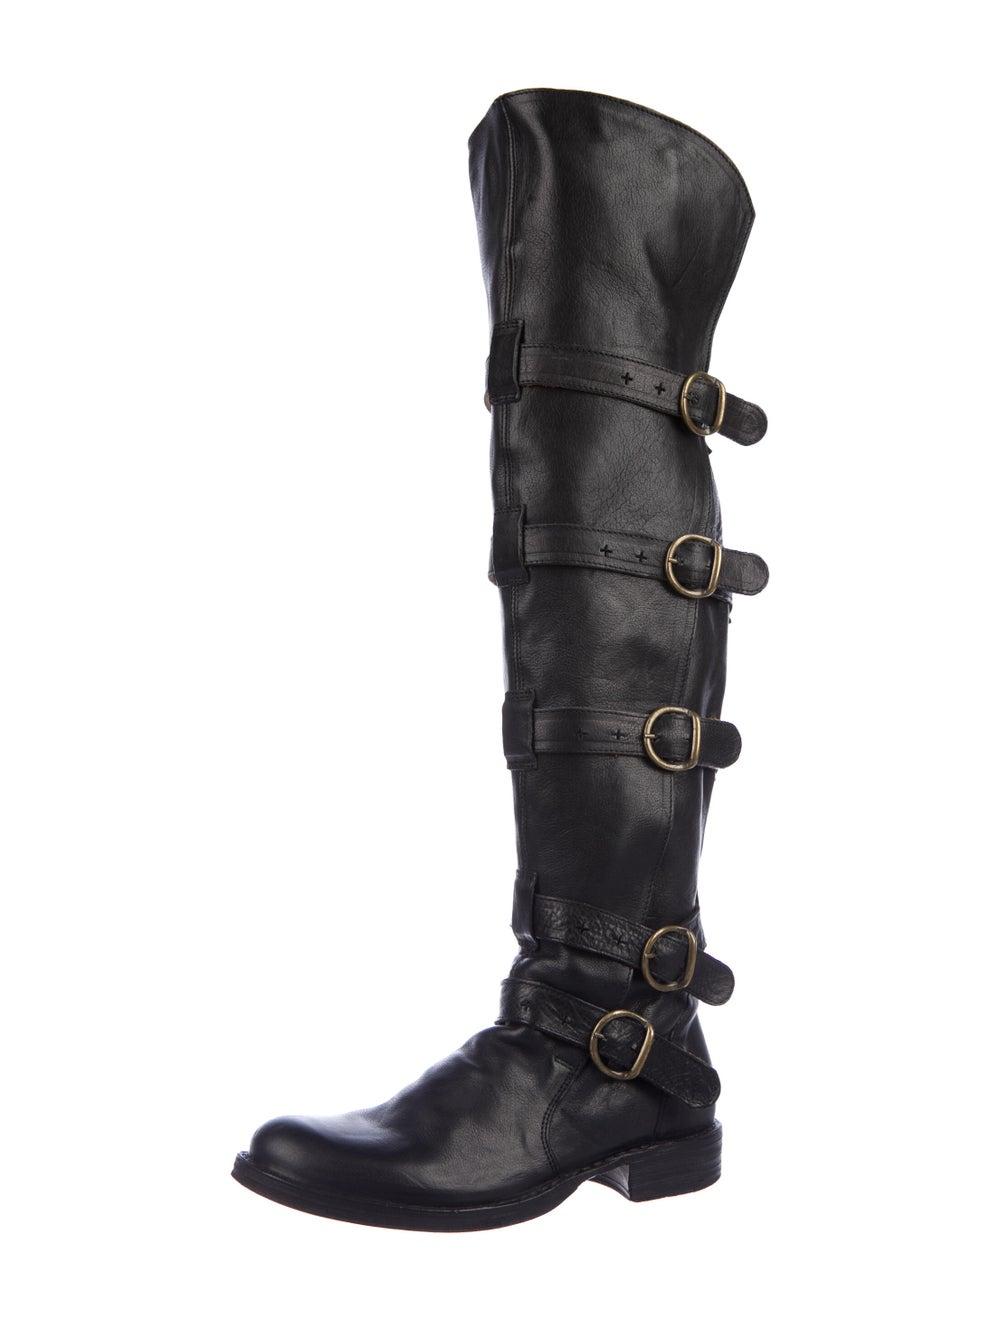 Fiorentini + Baker Leather Combat Boots Black - image 2